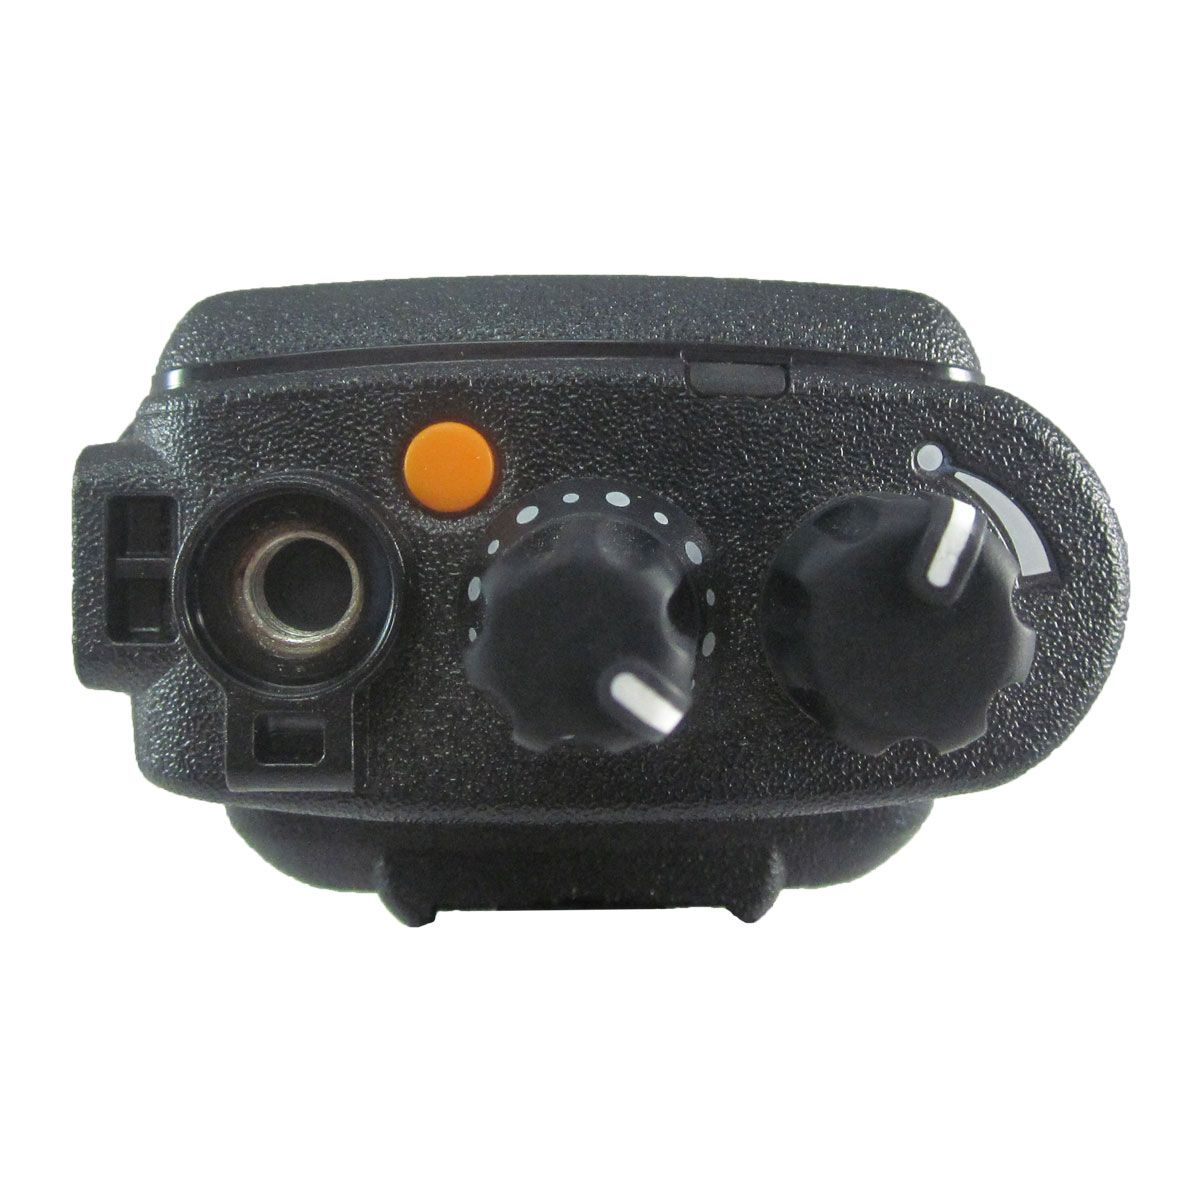 Radio Motorola DGP8050e Digital LAH56JDC9KA1AN VHF 136-174 MHz